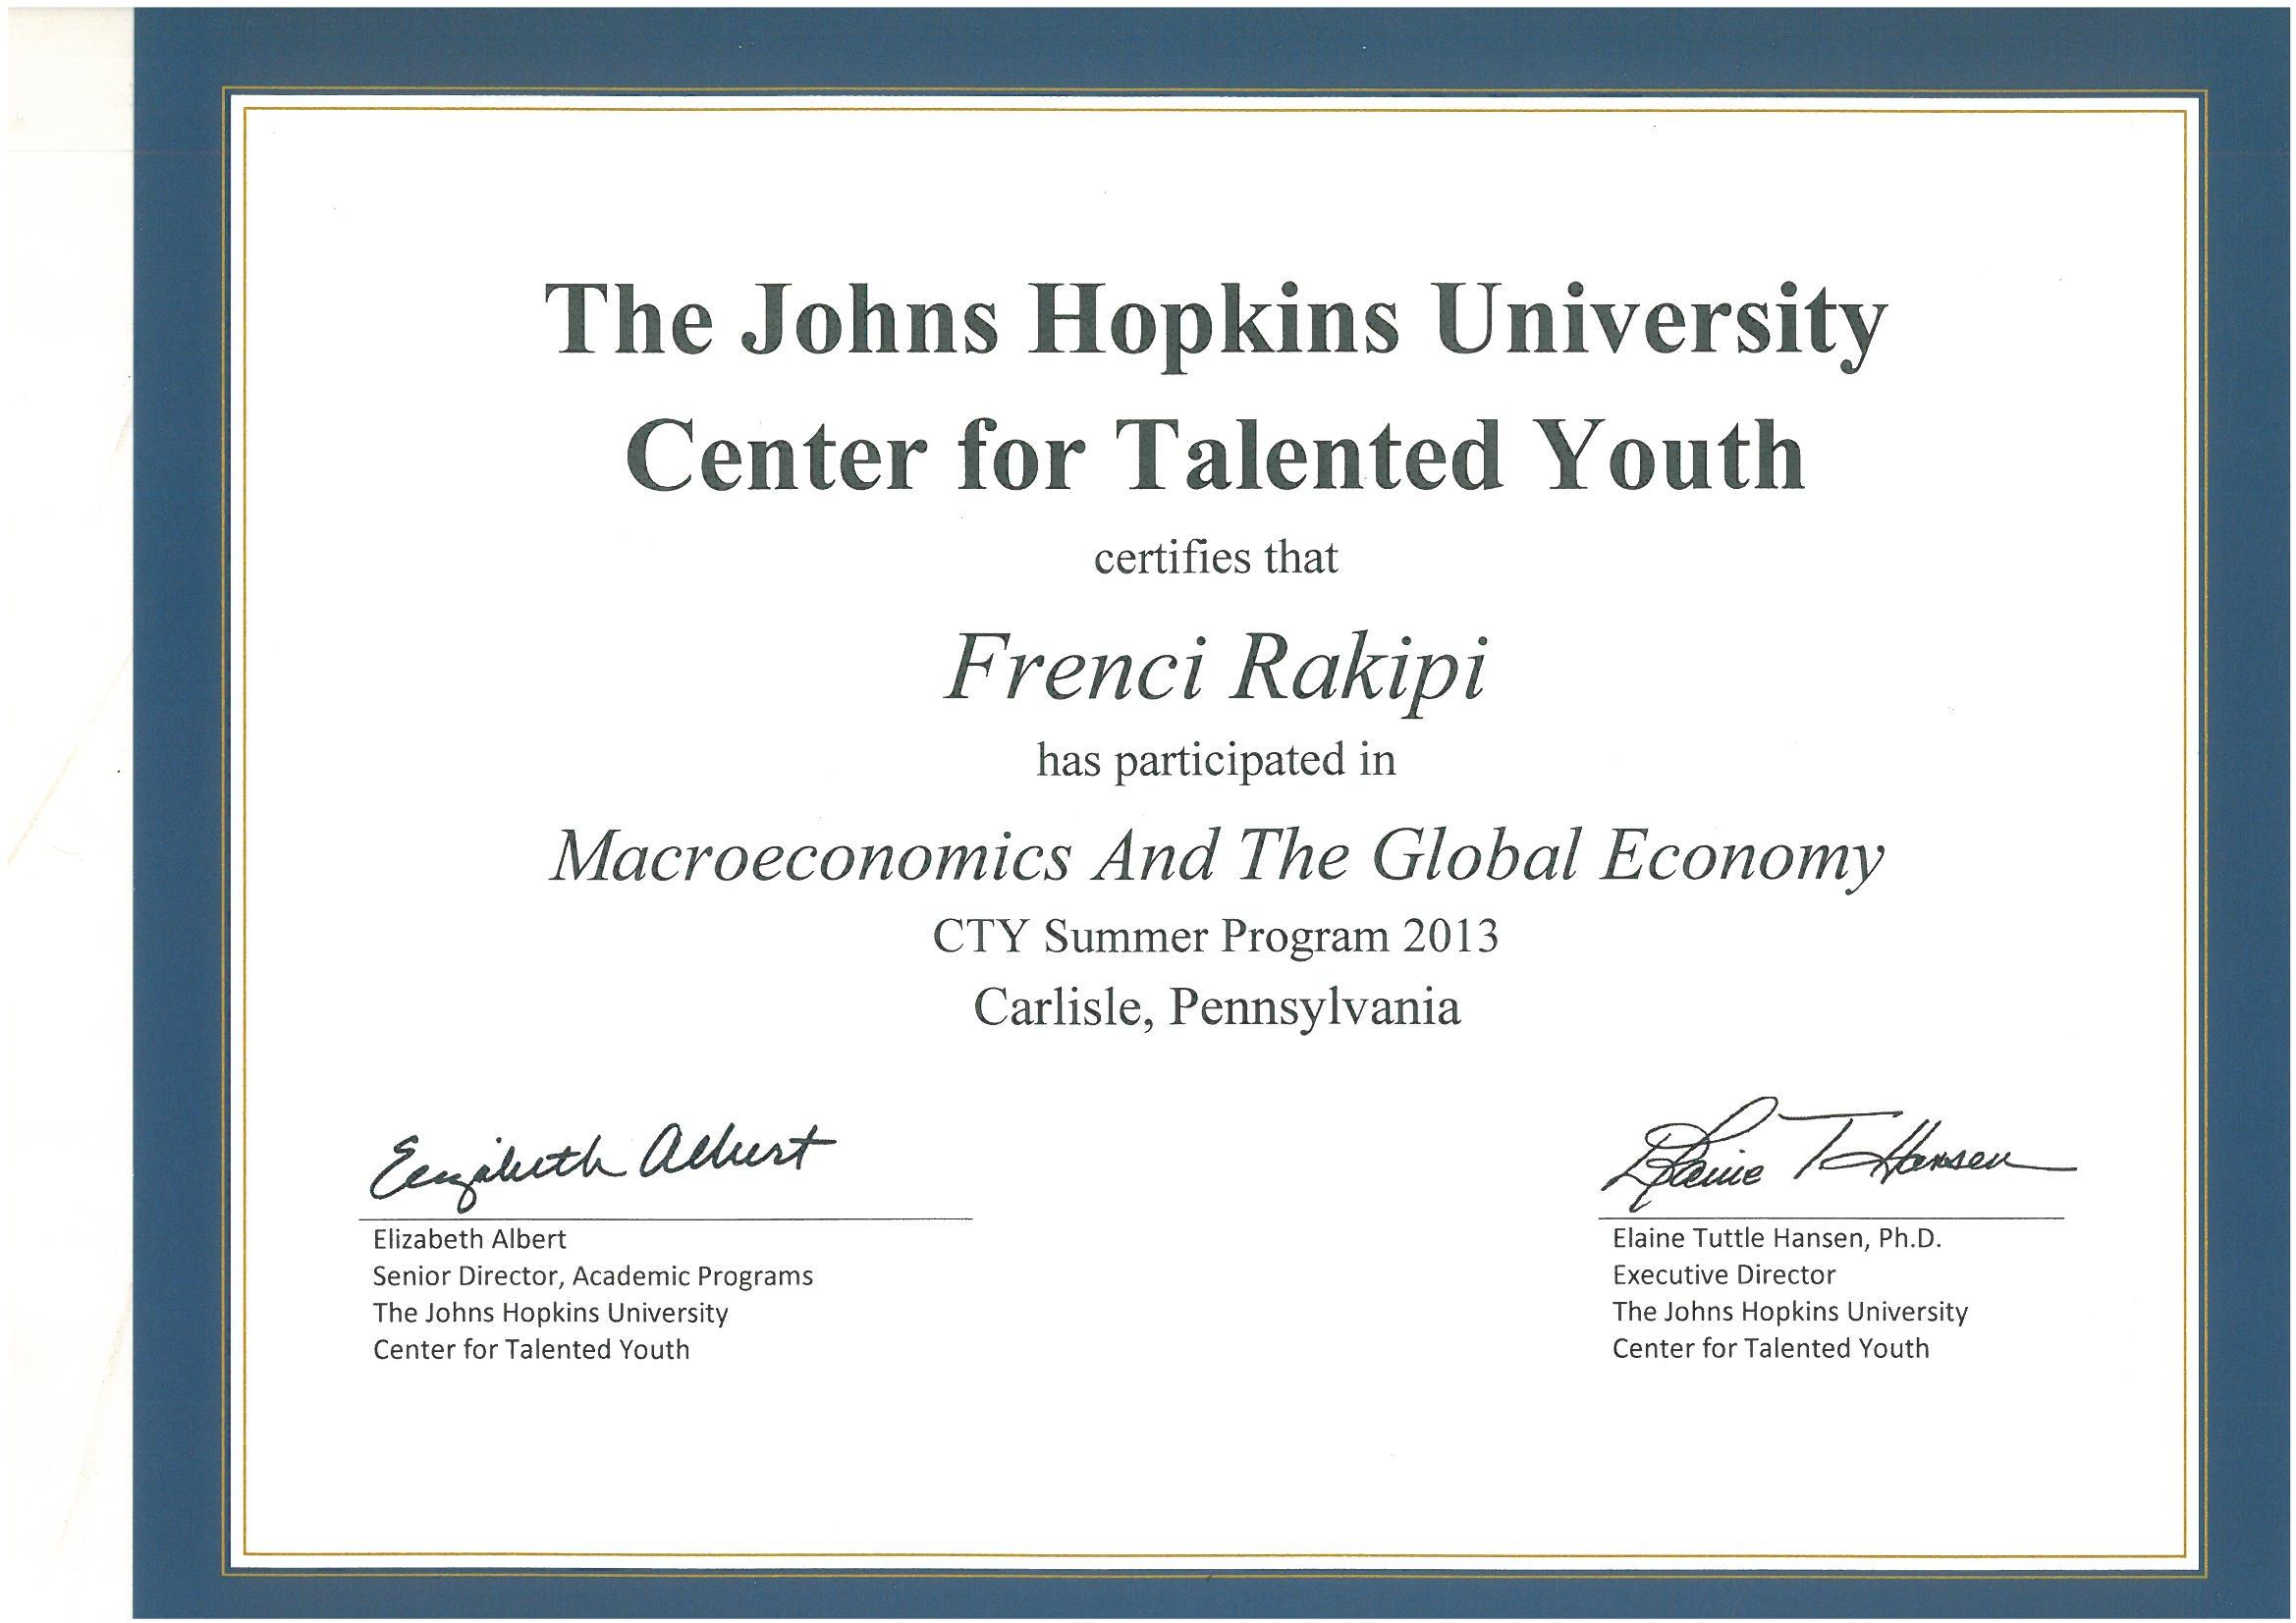 Certifikata e kursit 3 javor qe ndoqa ne Pensilvani, SHBA